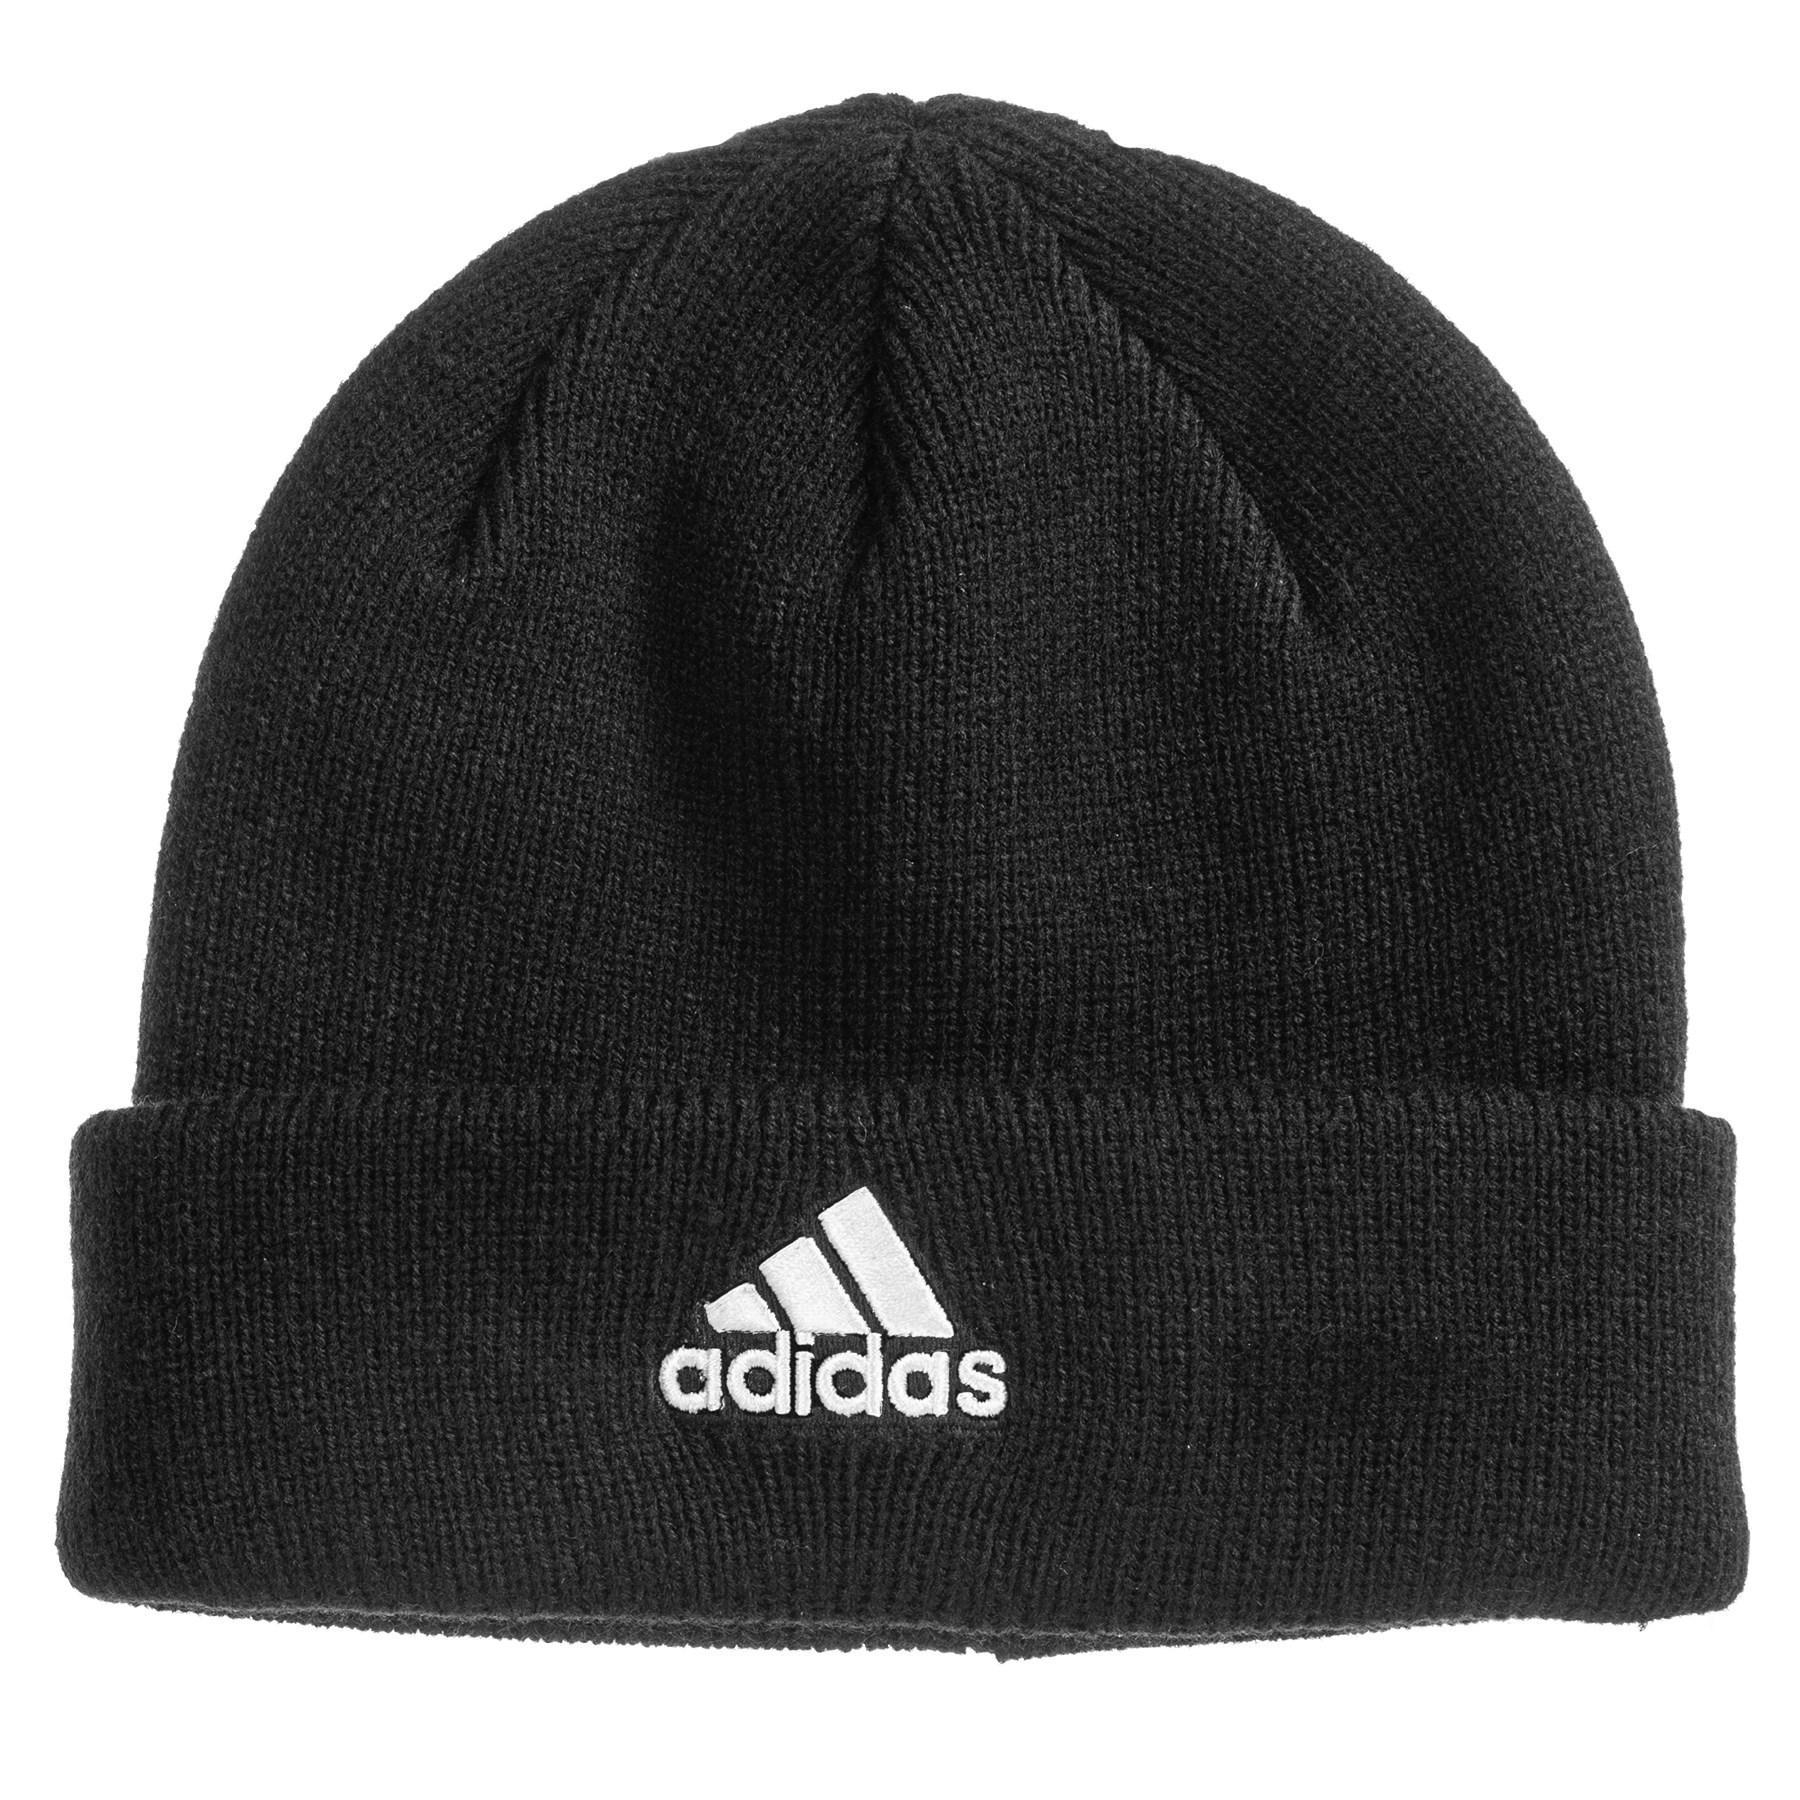 designer fashion c7b80 7181a Adidas - Black Team Beanie (for Women) - Lyst. View fullscreen